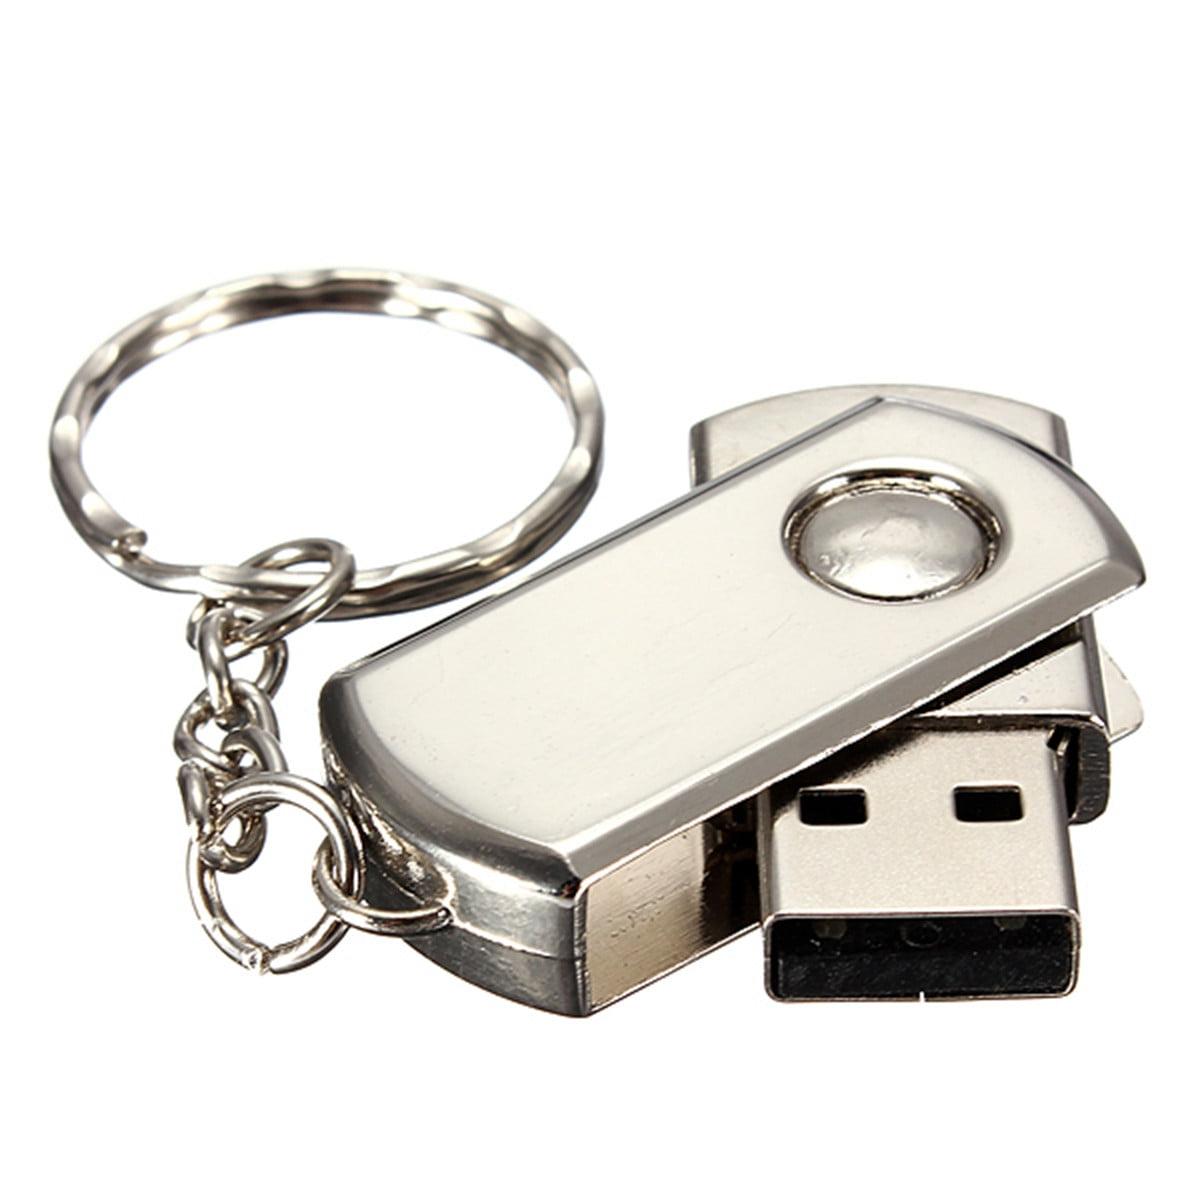 64GB USB 2.0 Silver Metal Swivel Flash Memory Stick Storage Thumb Pen Drive